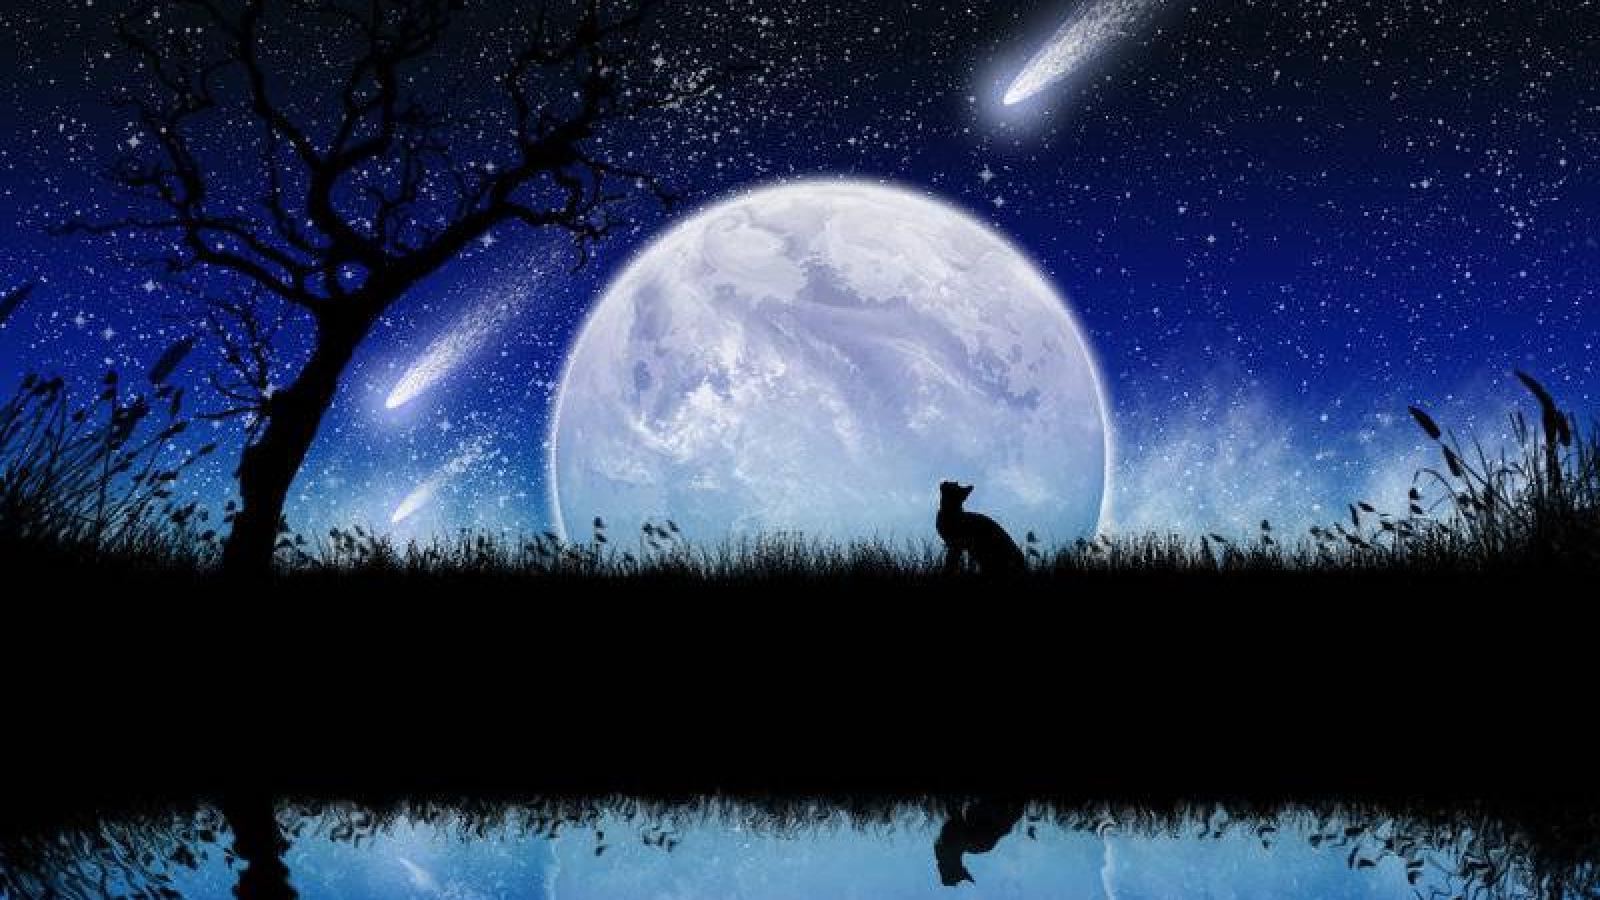 Stars cats moon outdoors pond shooting star tree wallpaper   20314 1600x900